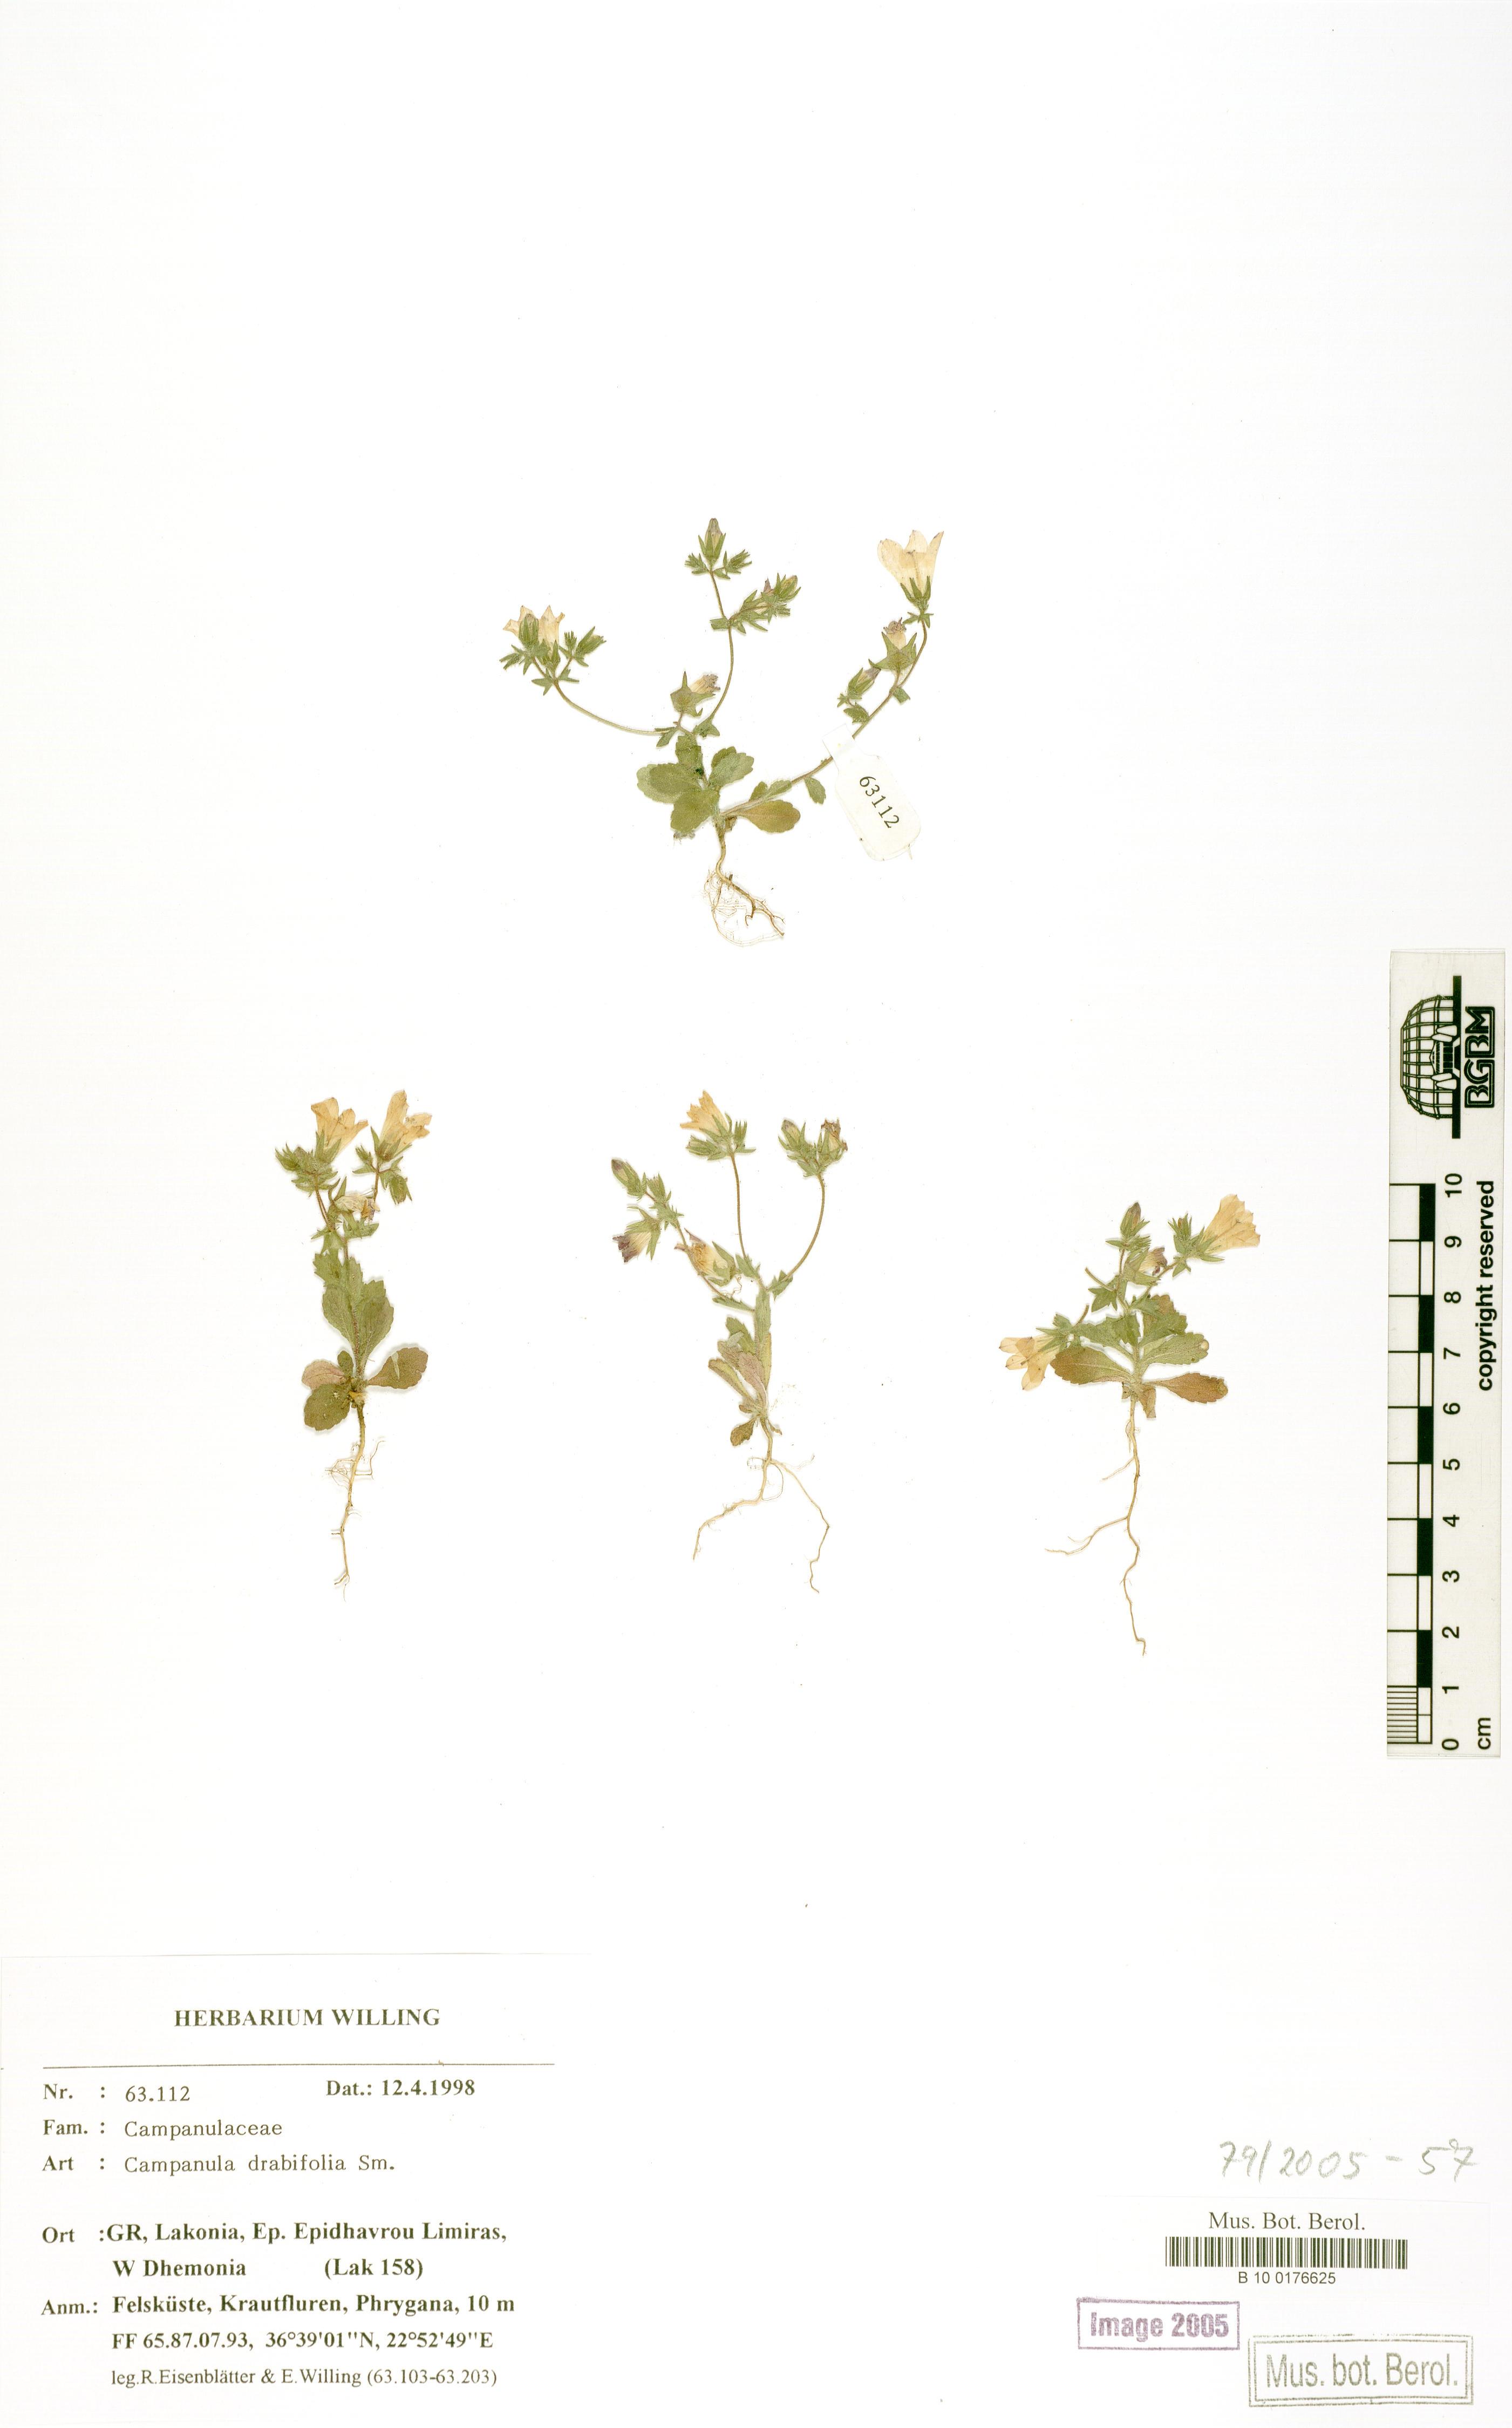 http://ww2.bgbm.org/herbarium/images/B/10/01/76/62/B_10_0176625.jpg